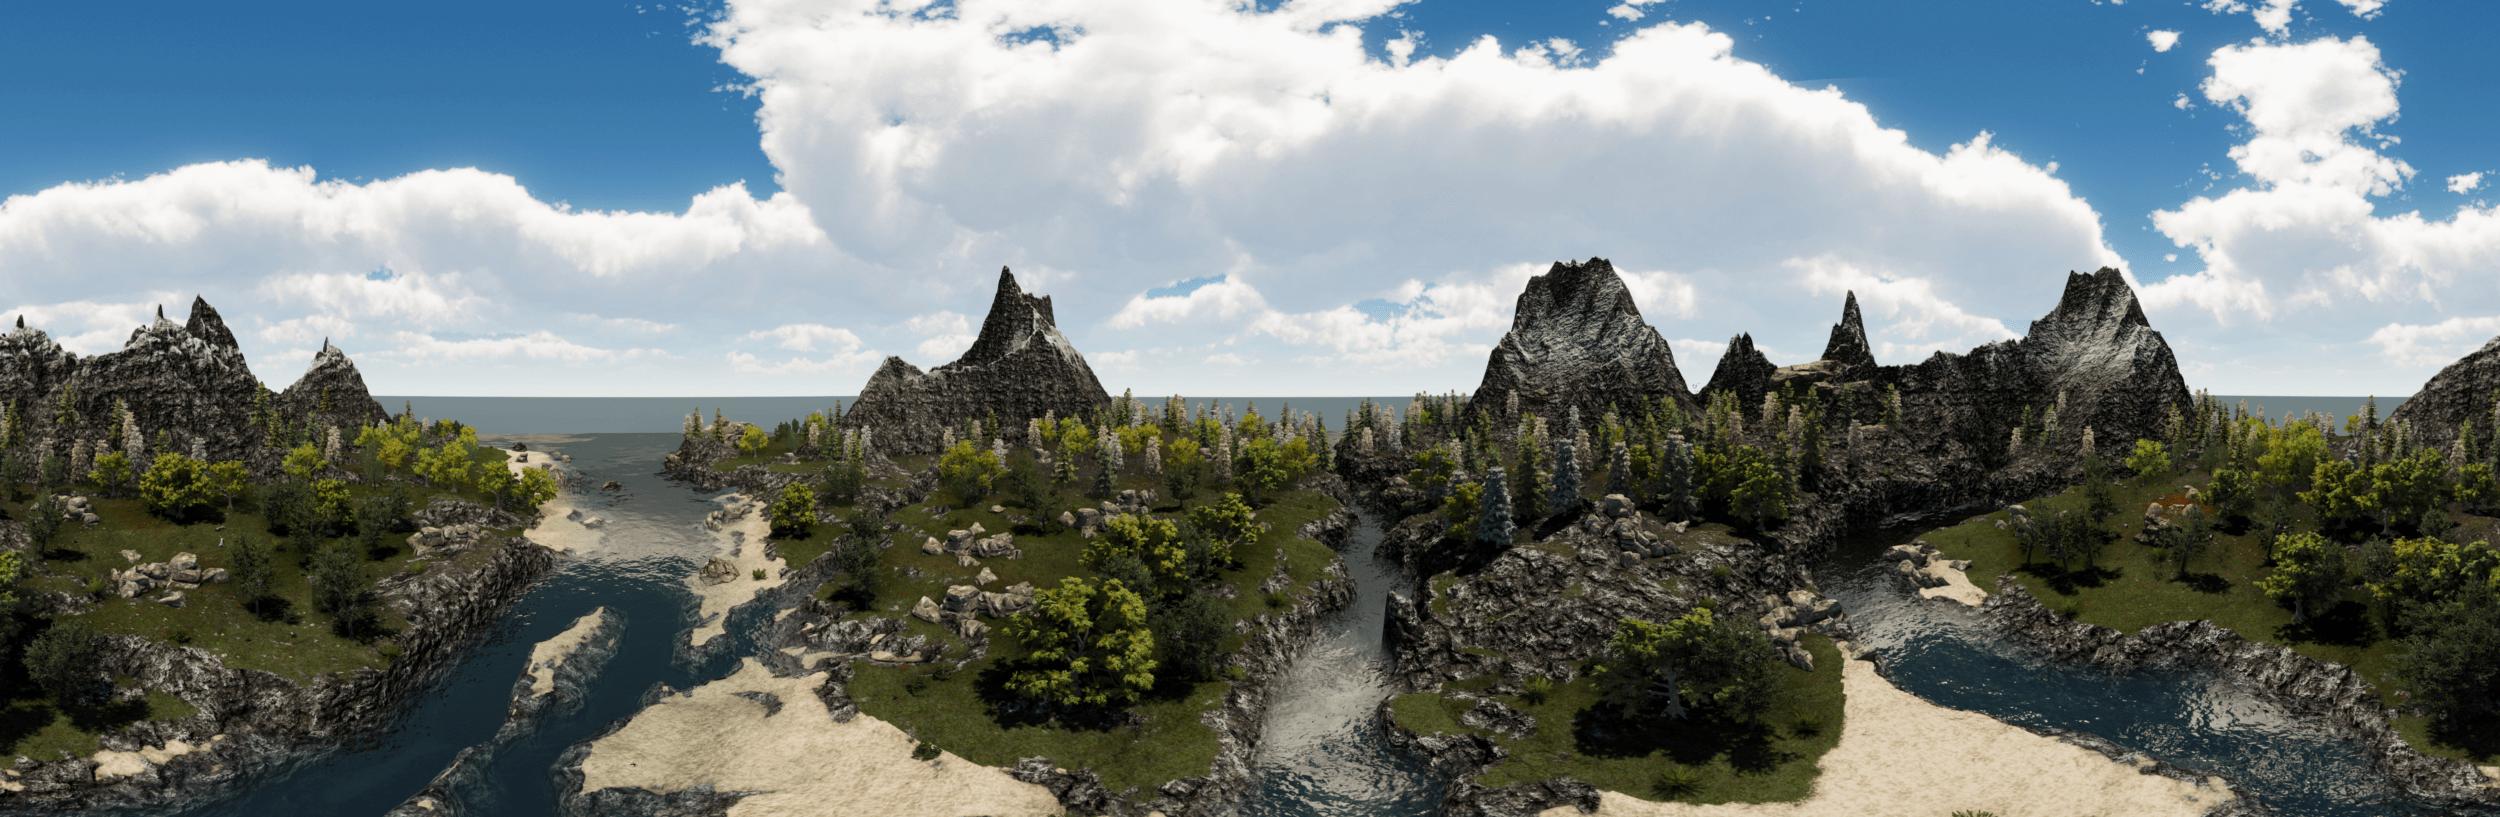 Prehistoric virtual world